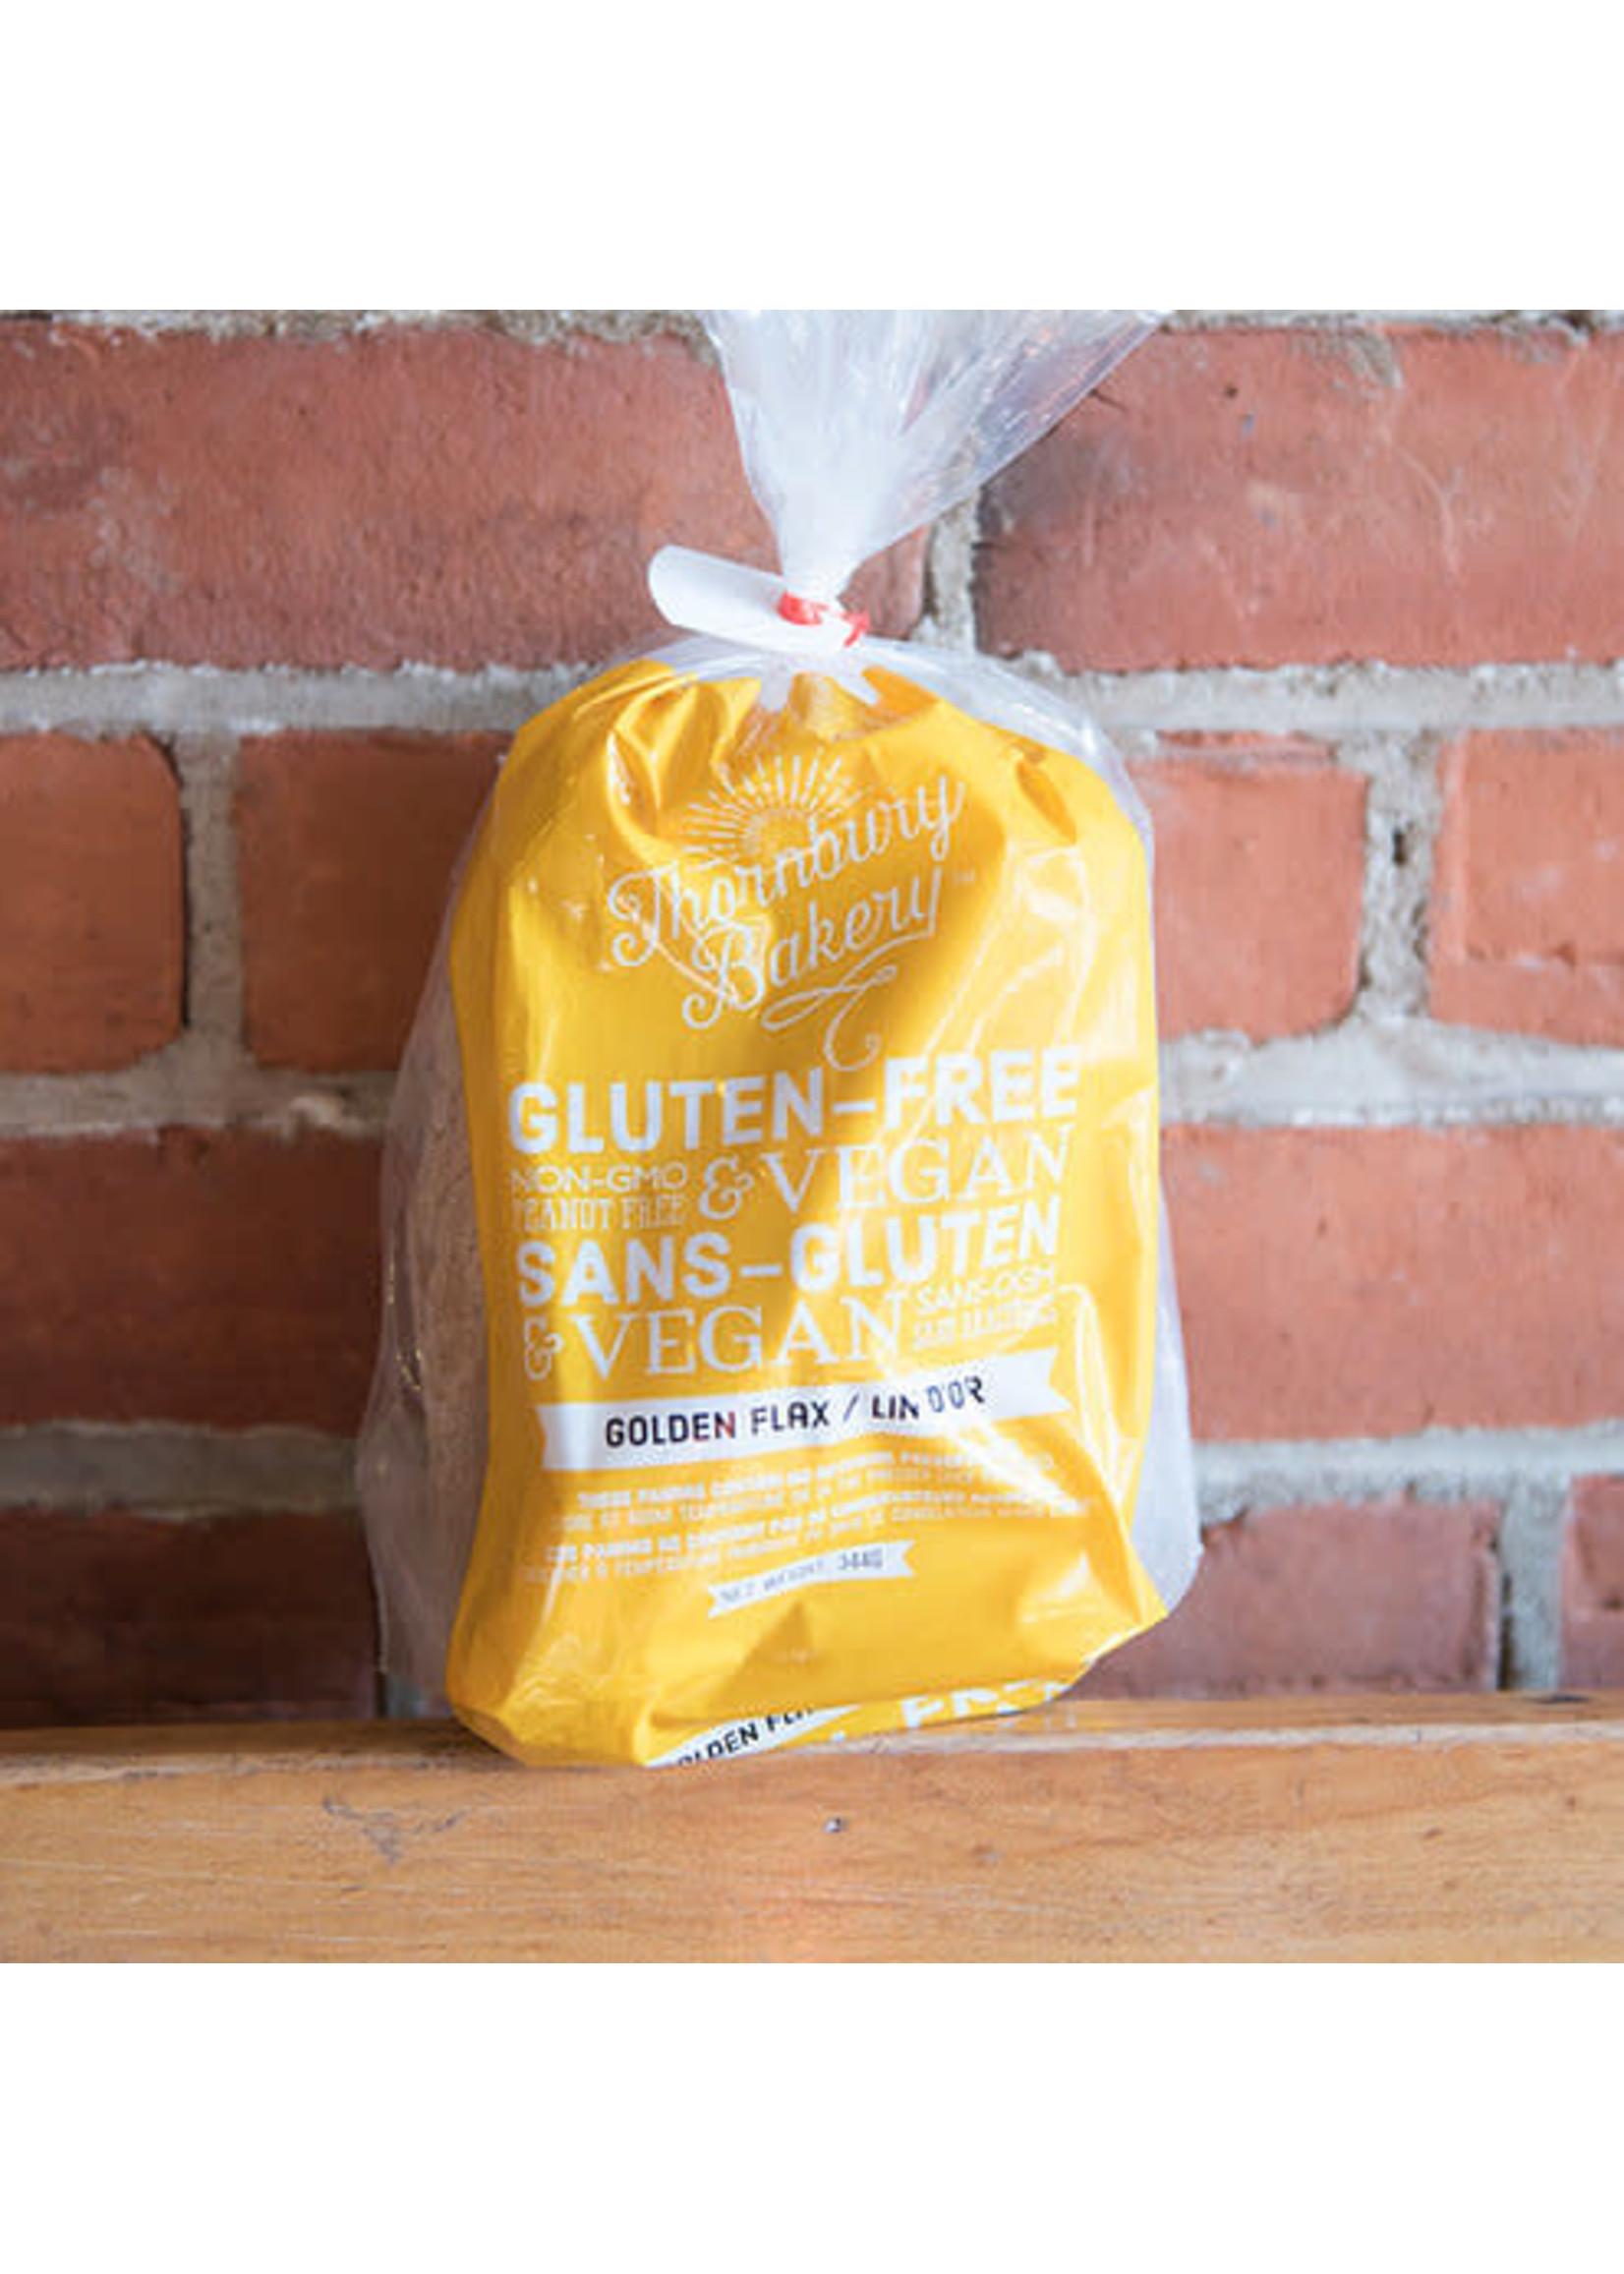 Thornbury Bakery D/CThornbury Bakery- Golden Flax Panini Style Bun (GF)